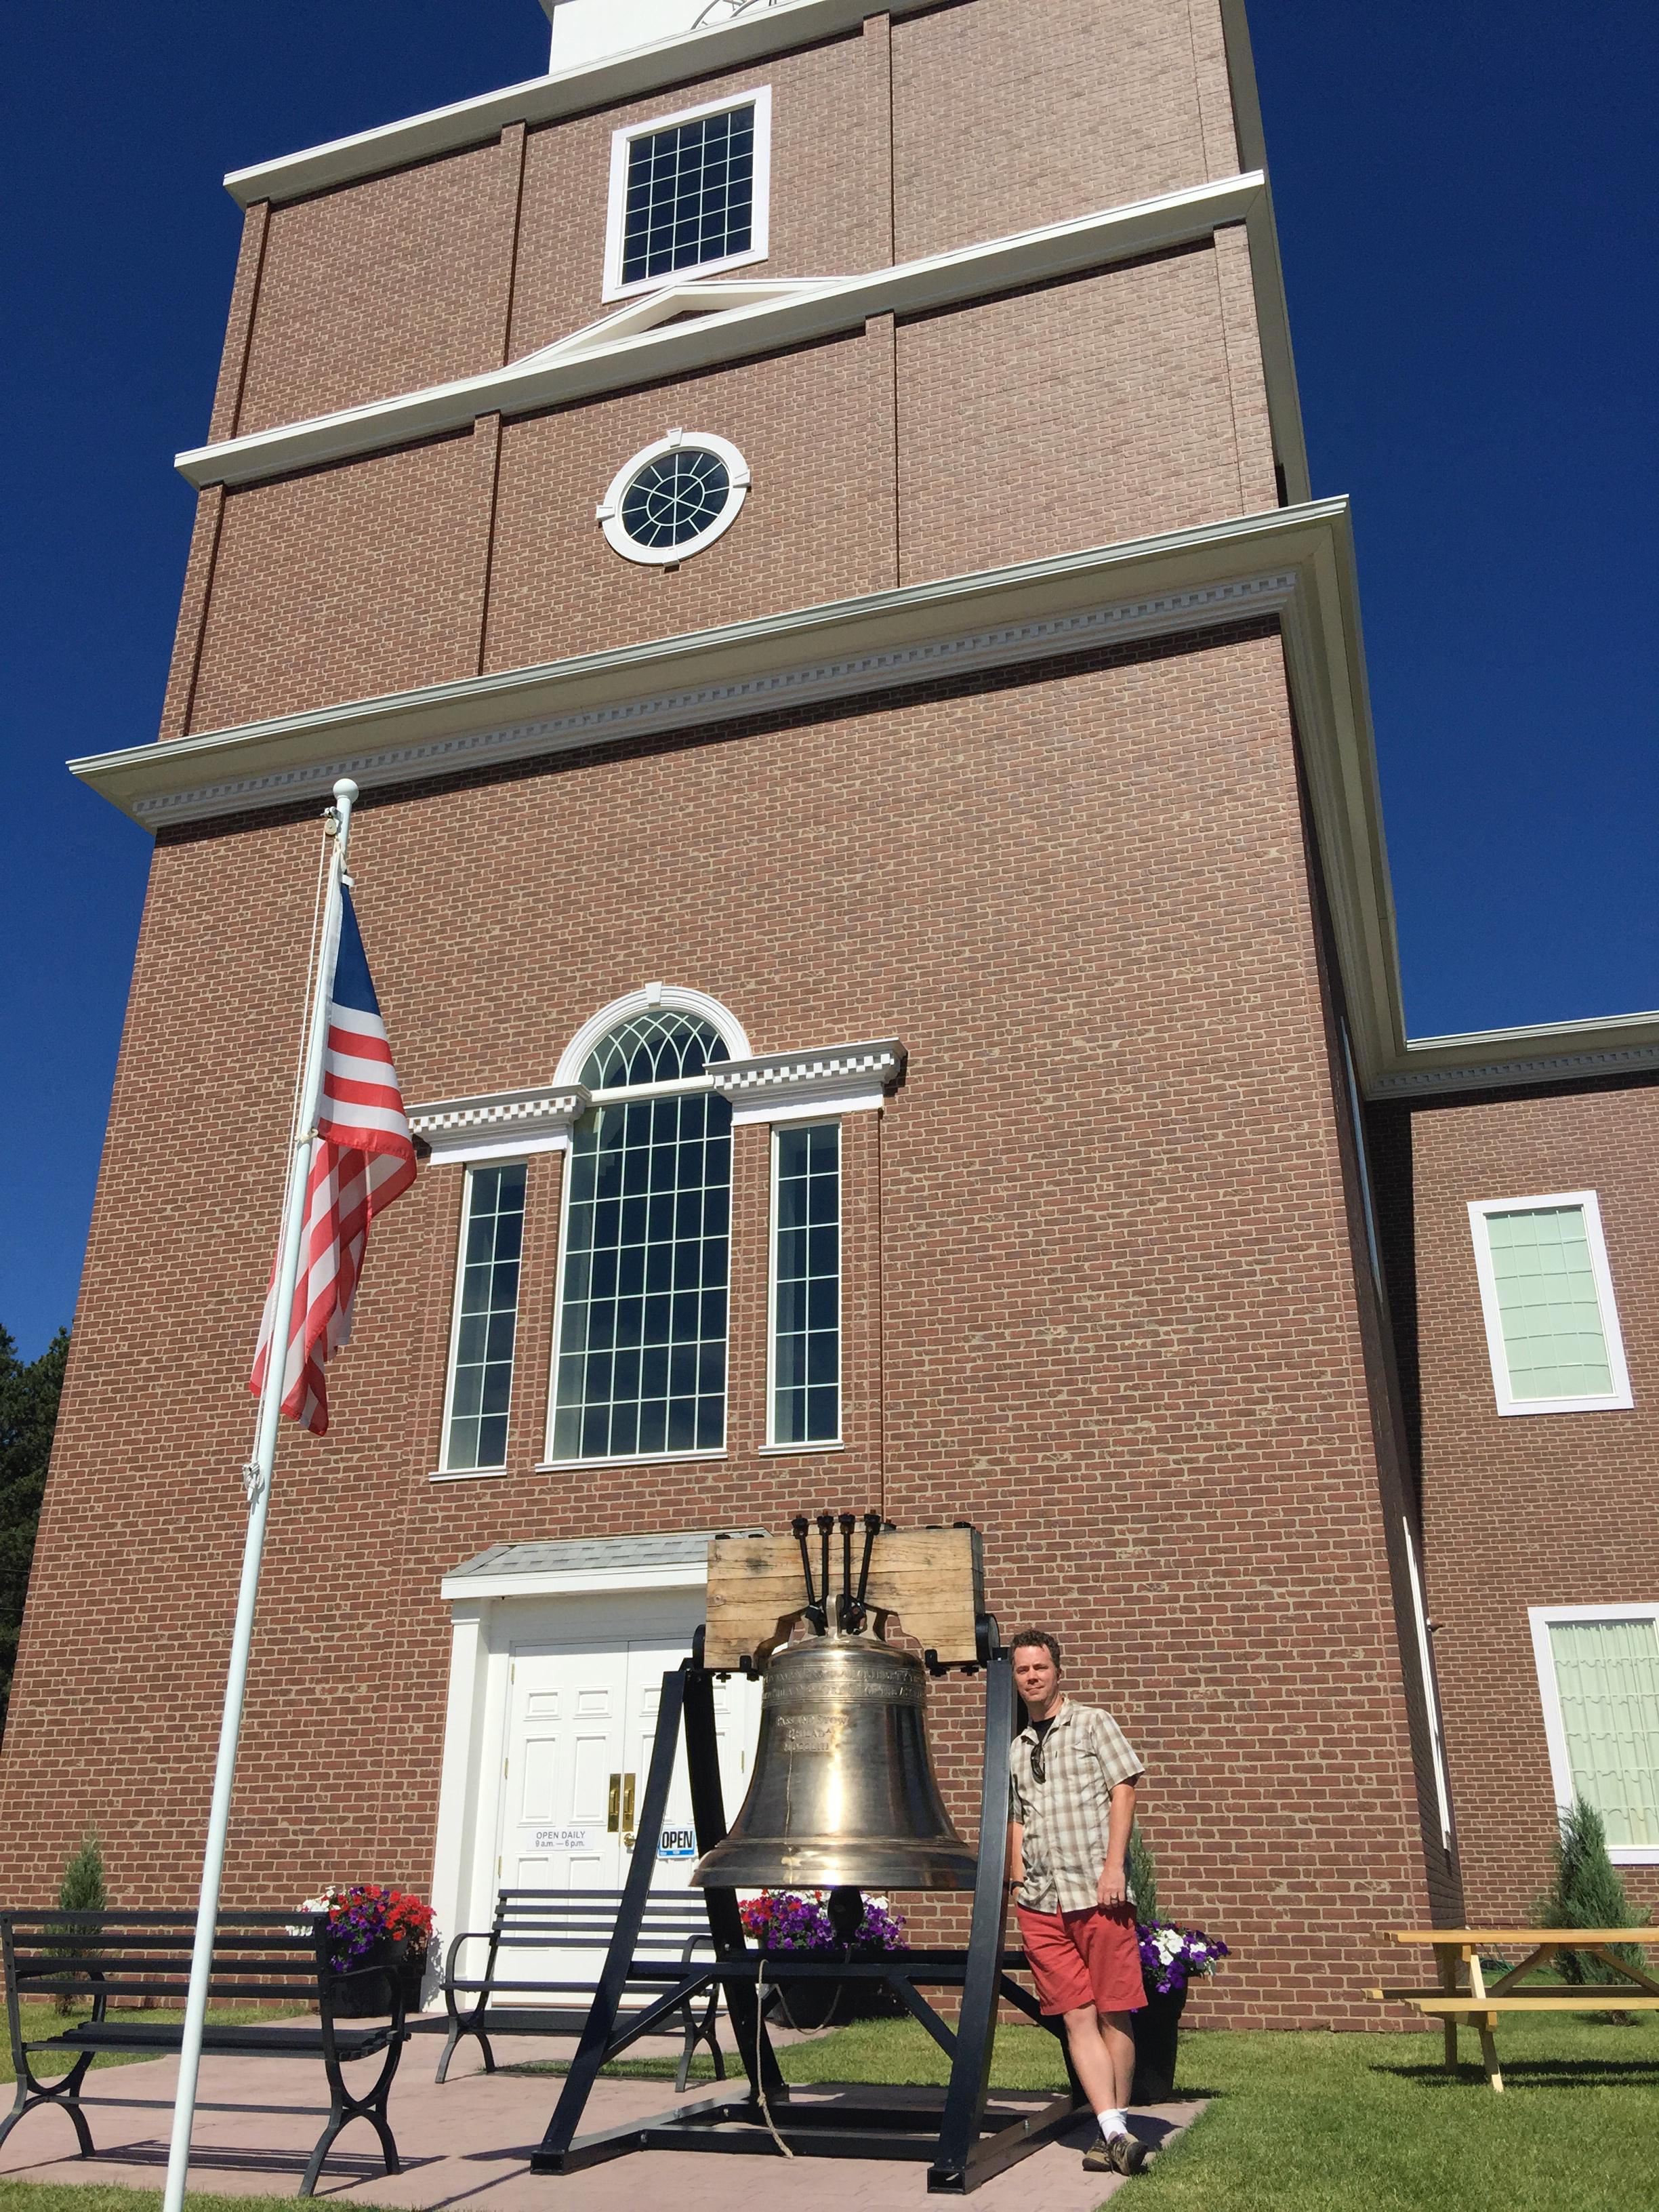 Other Liberty Bell replicas, Rapid City South Dakota